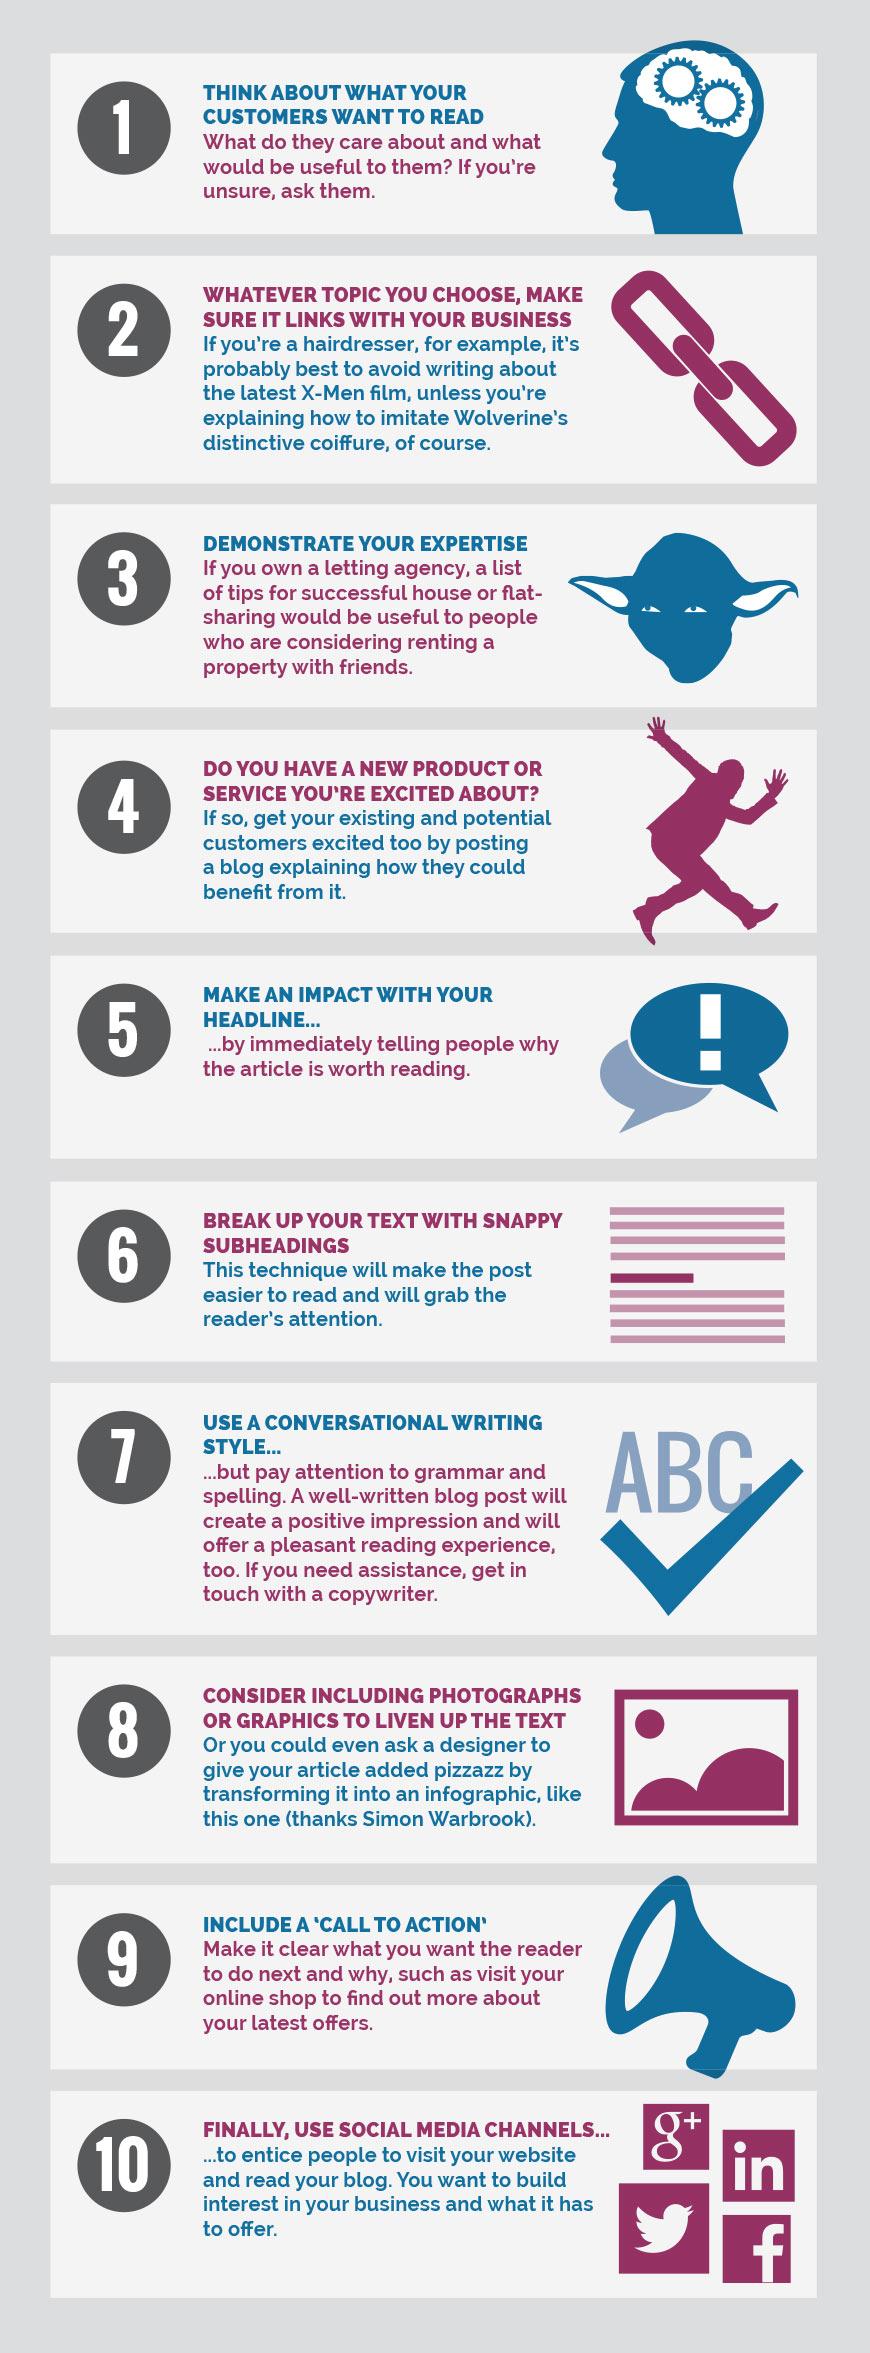 10 tips for terrific business blogs